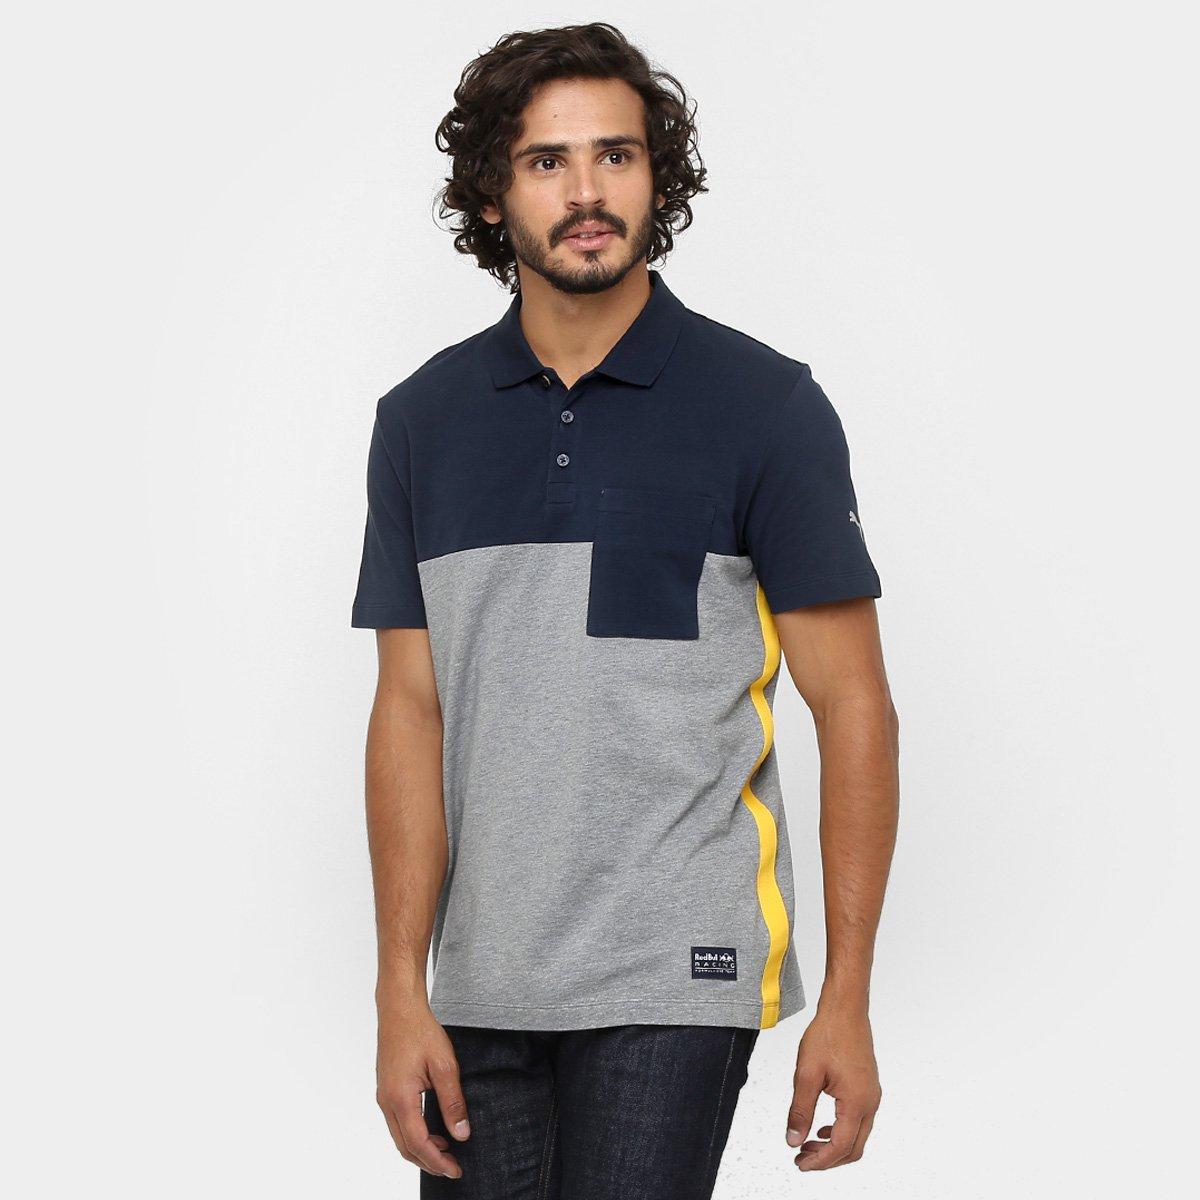 1b4800c9a1f42 Camiseta Pólo Puma Infiniti Red Bull Racing - Compre Agora